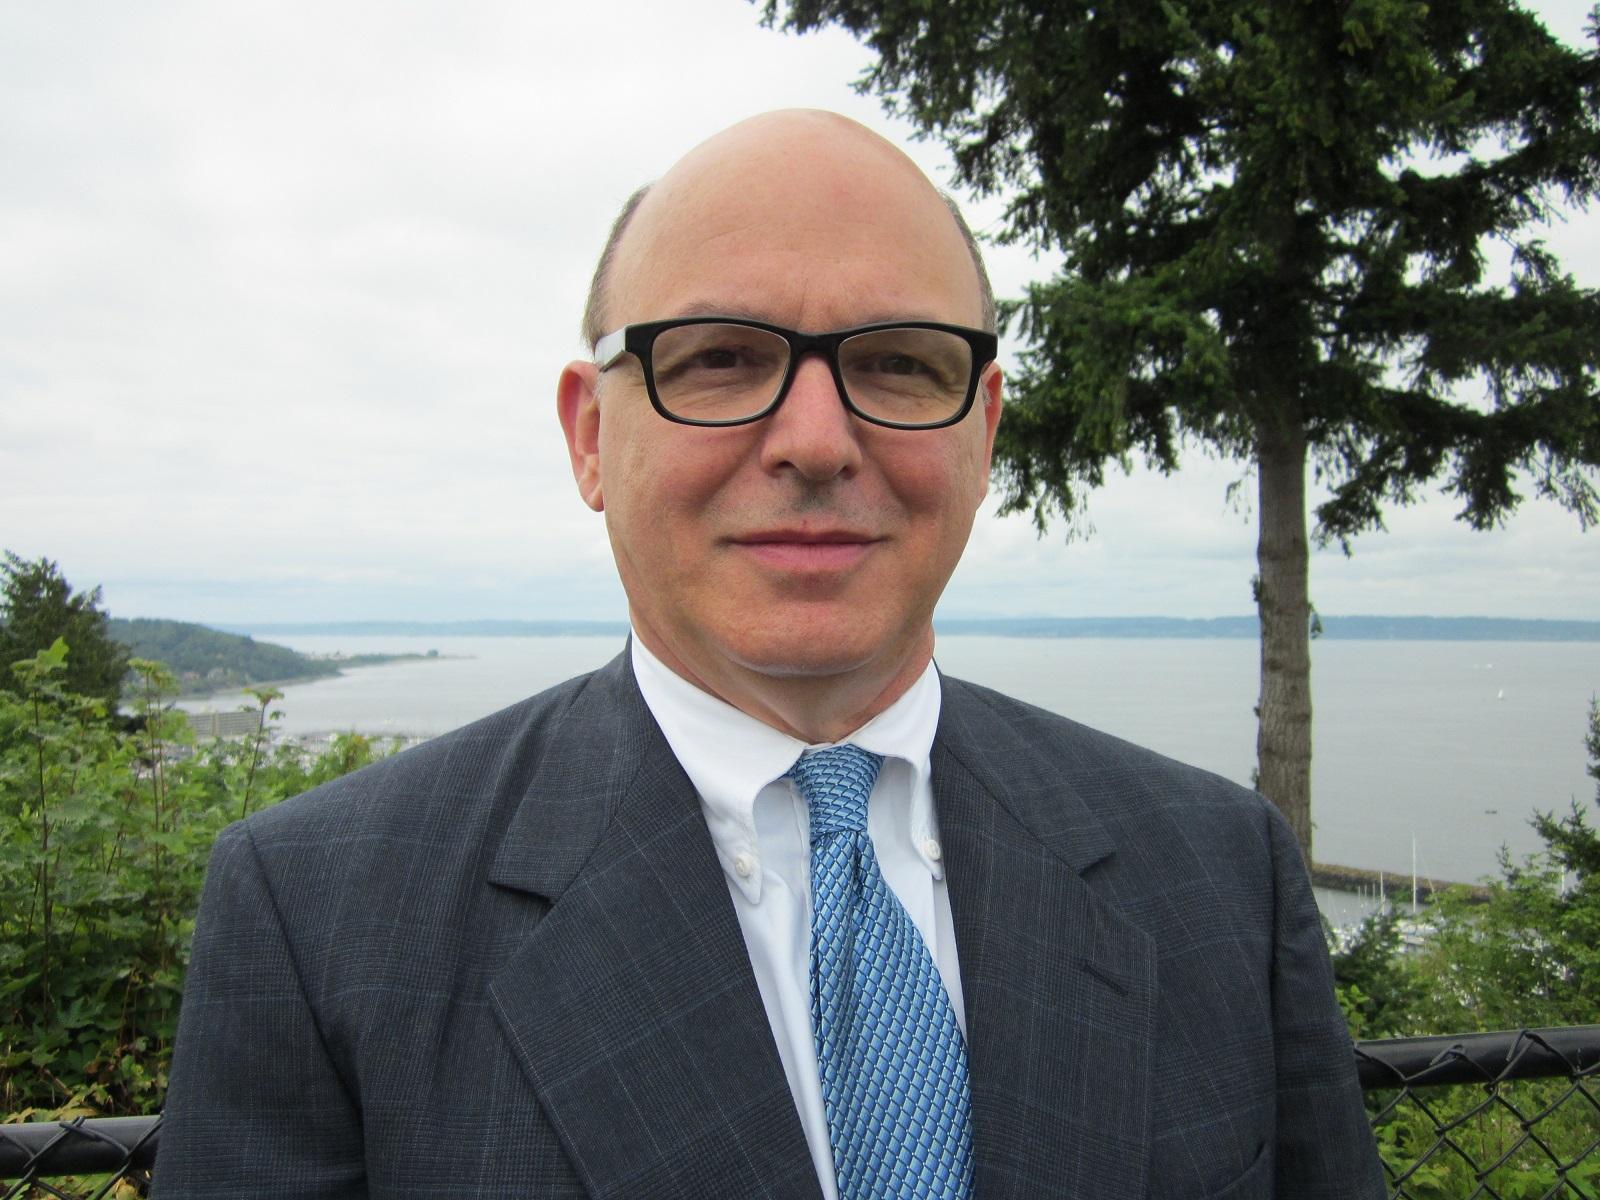 James T. Saulsbury, Attorney at Law